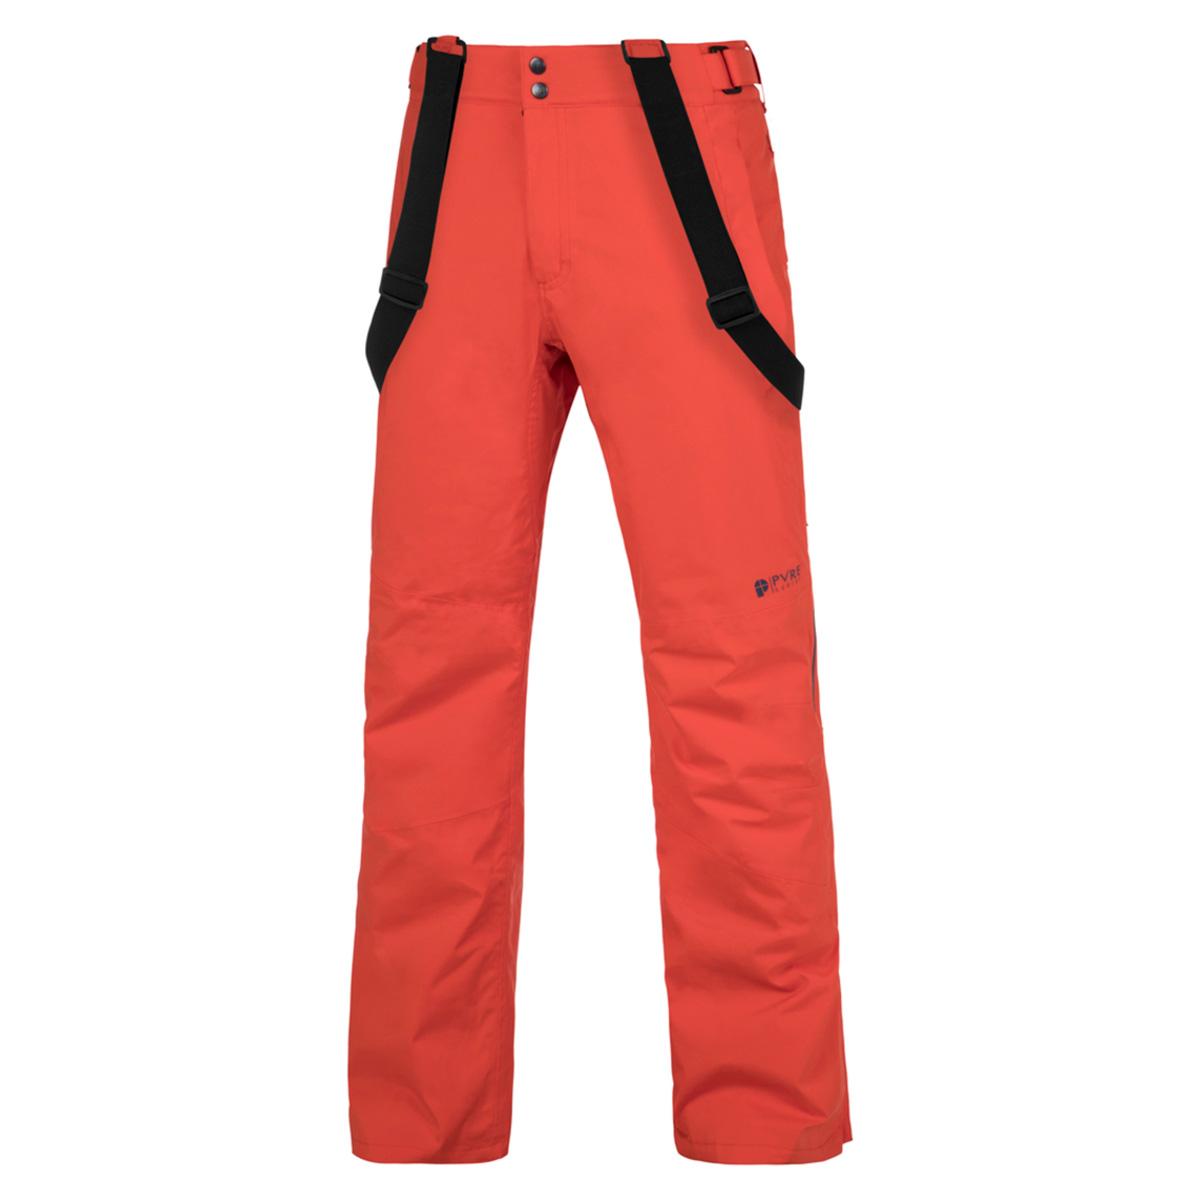 Oranje heren skibroek Protest Mikka 4710282 919919